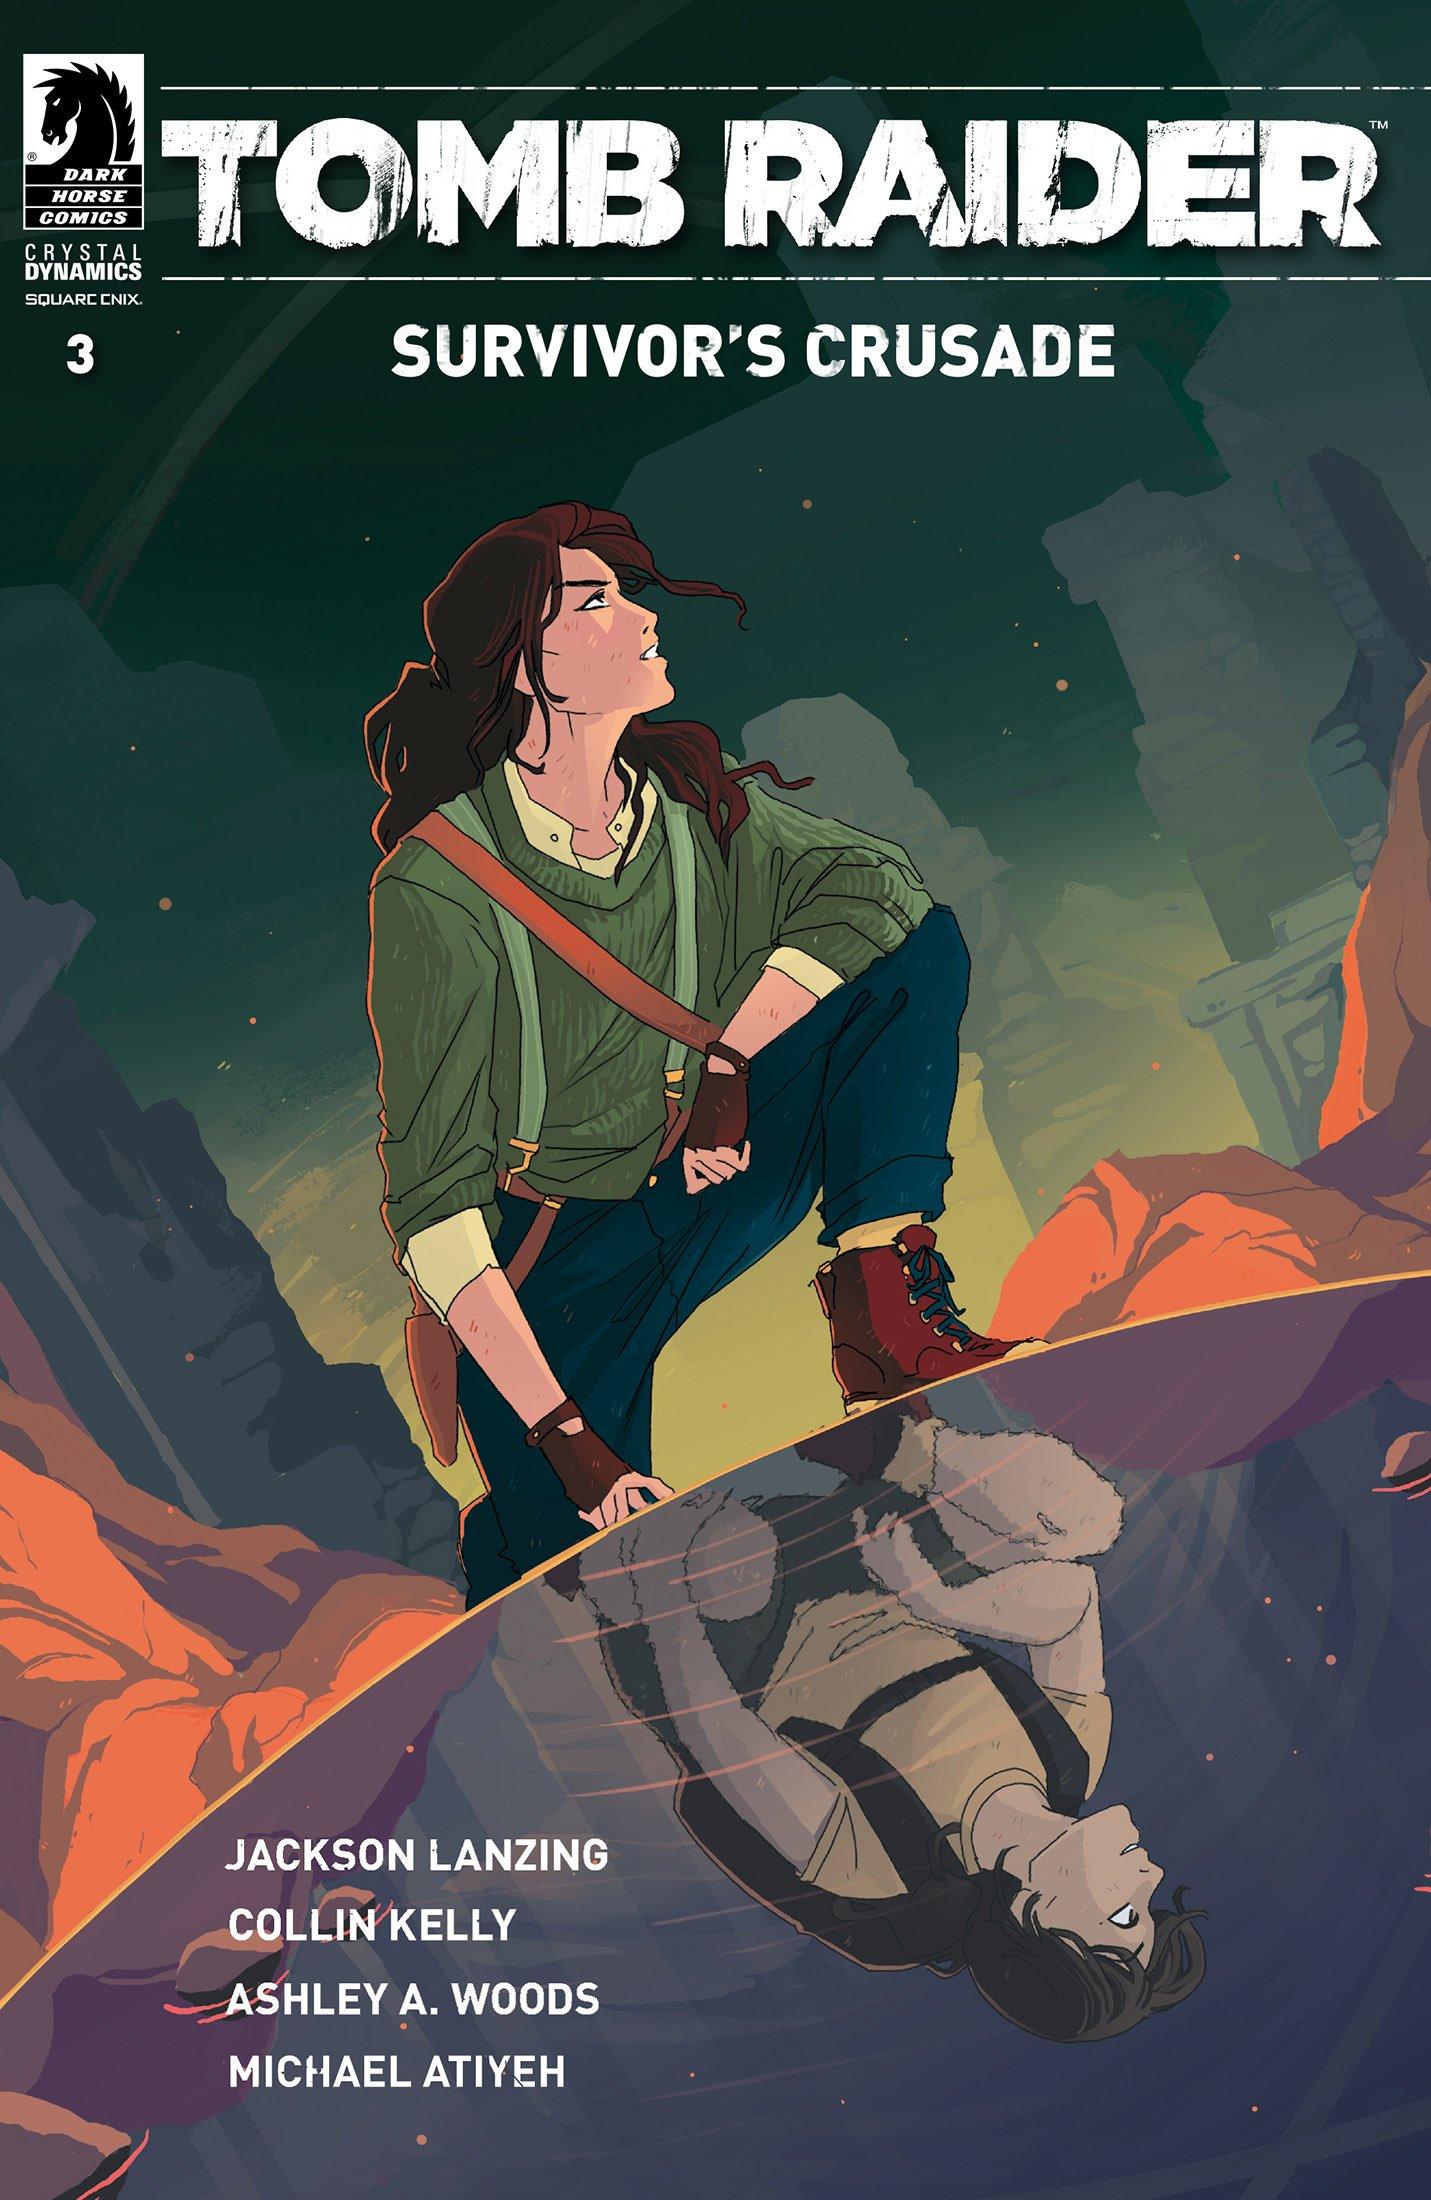 Tomb Raider - Survivor's Crusade 003 (February 2018)